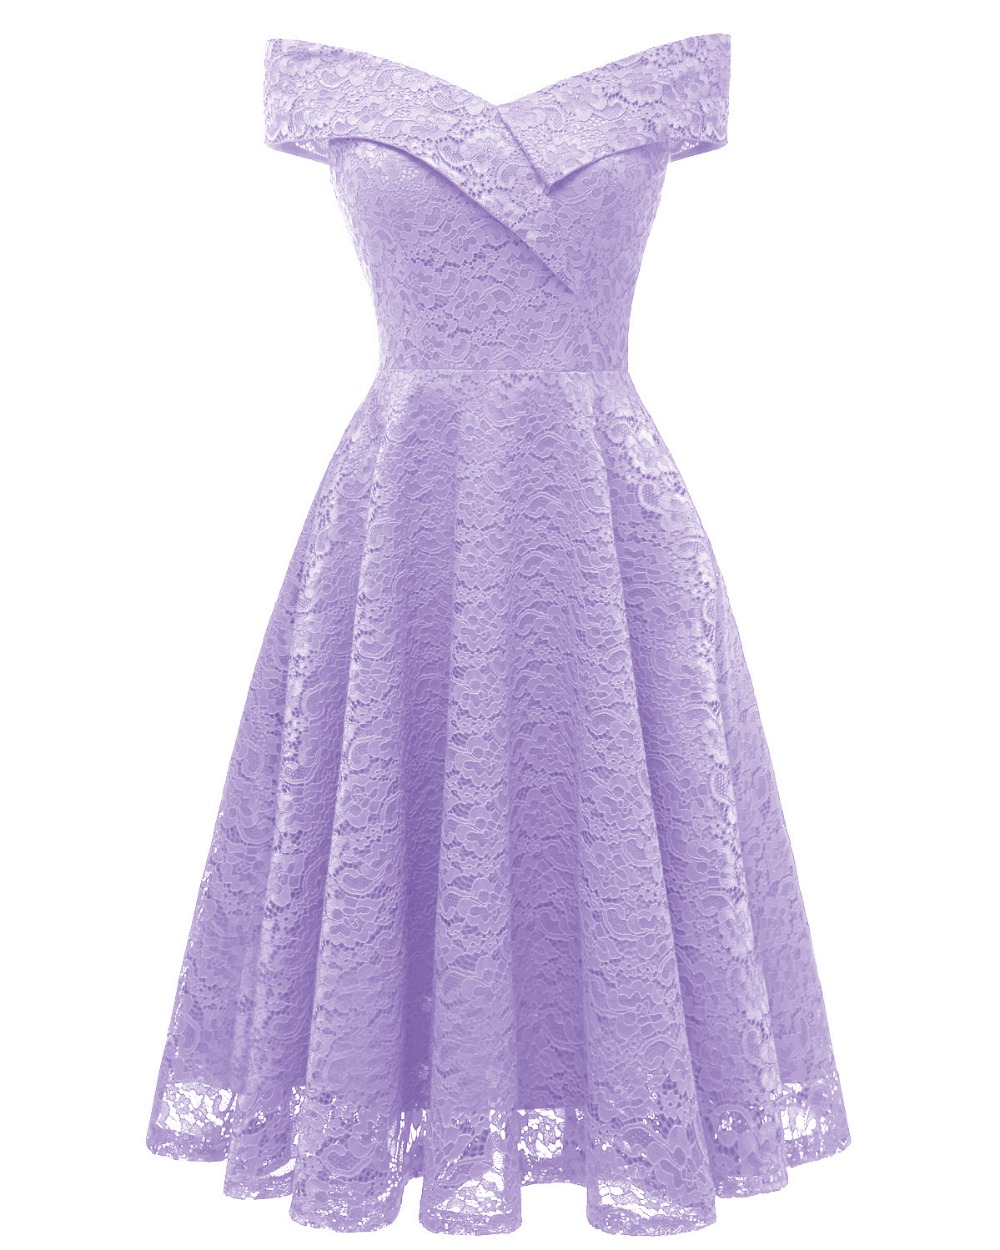 Robe de soiree voilet short prom   dress   fashinable   evening     Dresses   lace 2019   evening   gown formal   dress   vestido de noiva